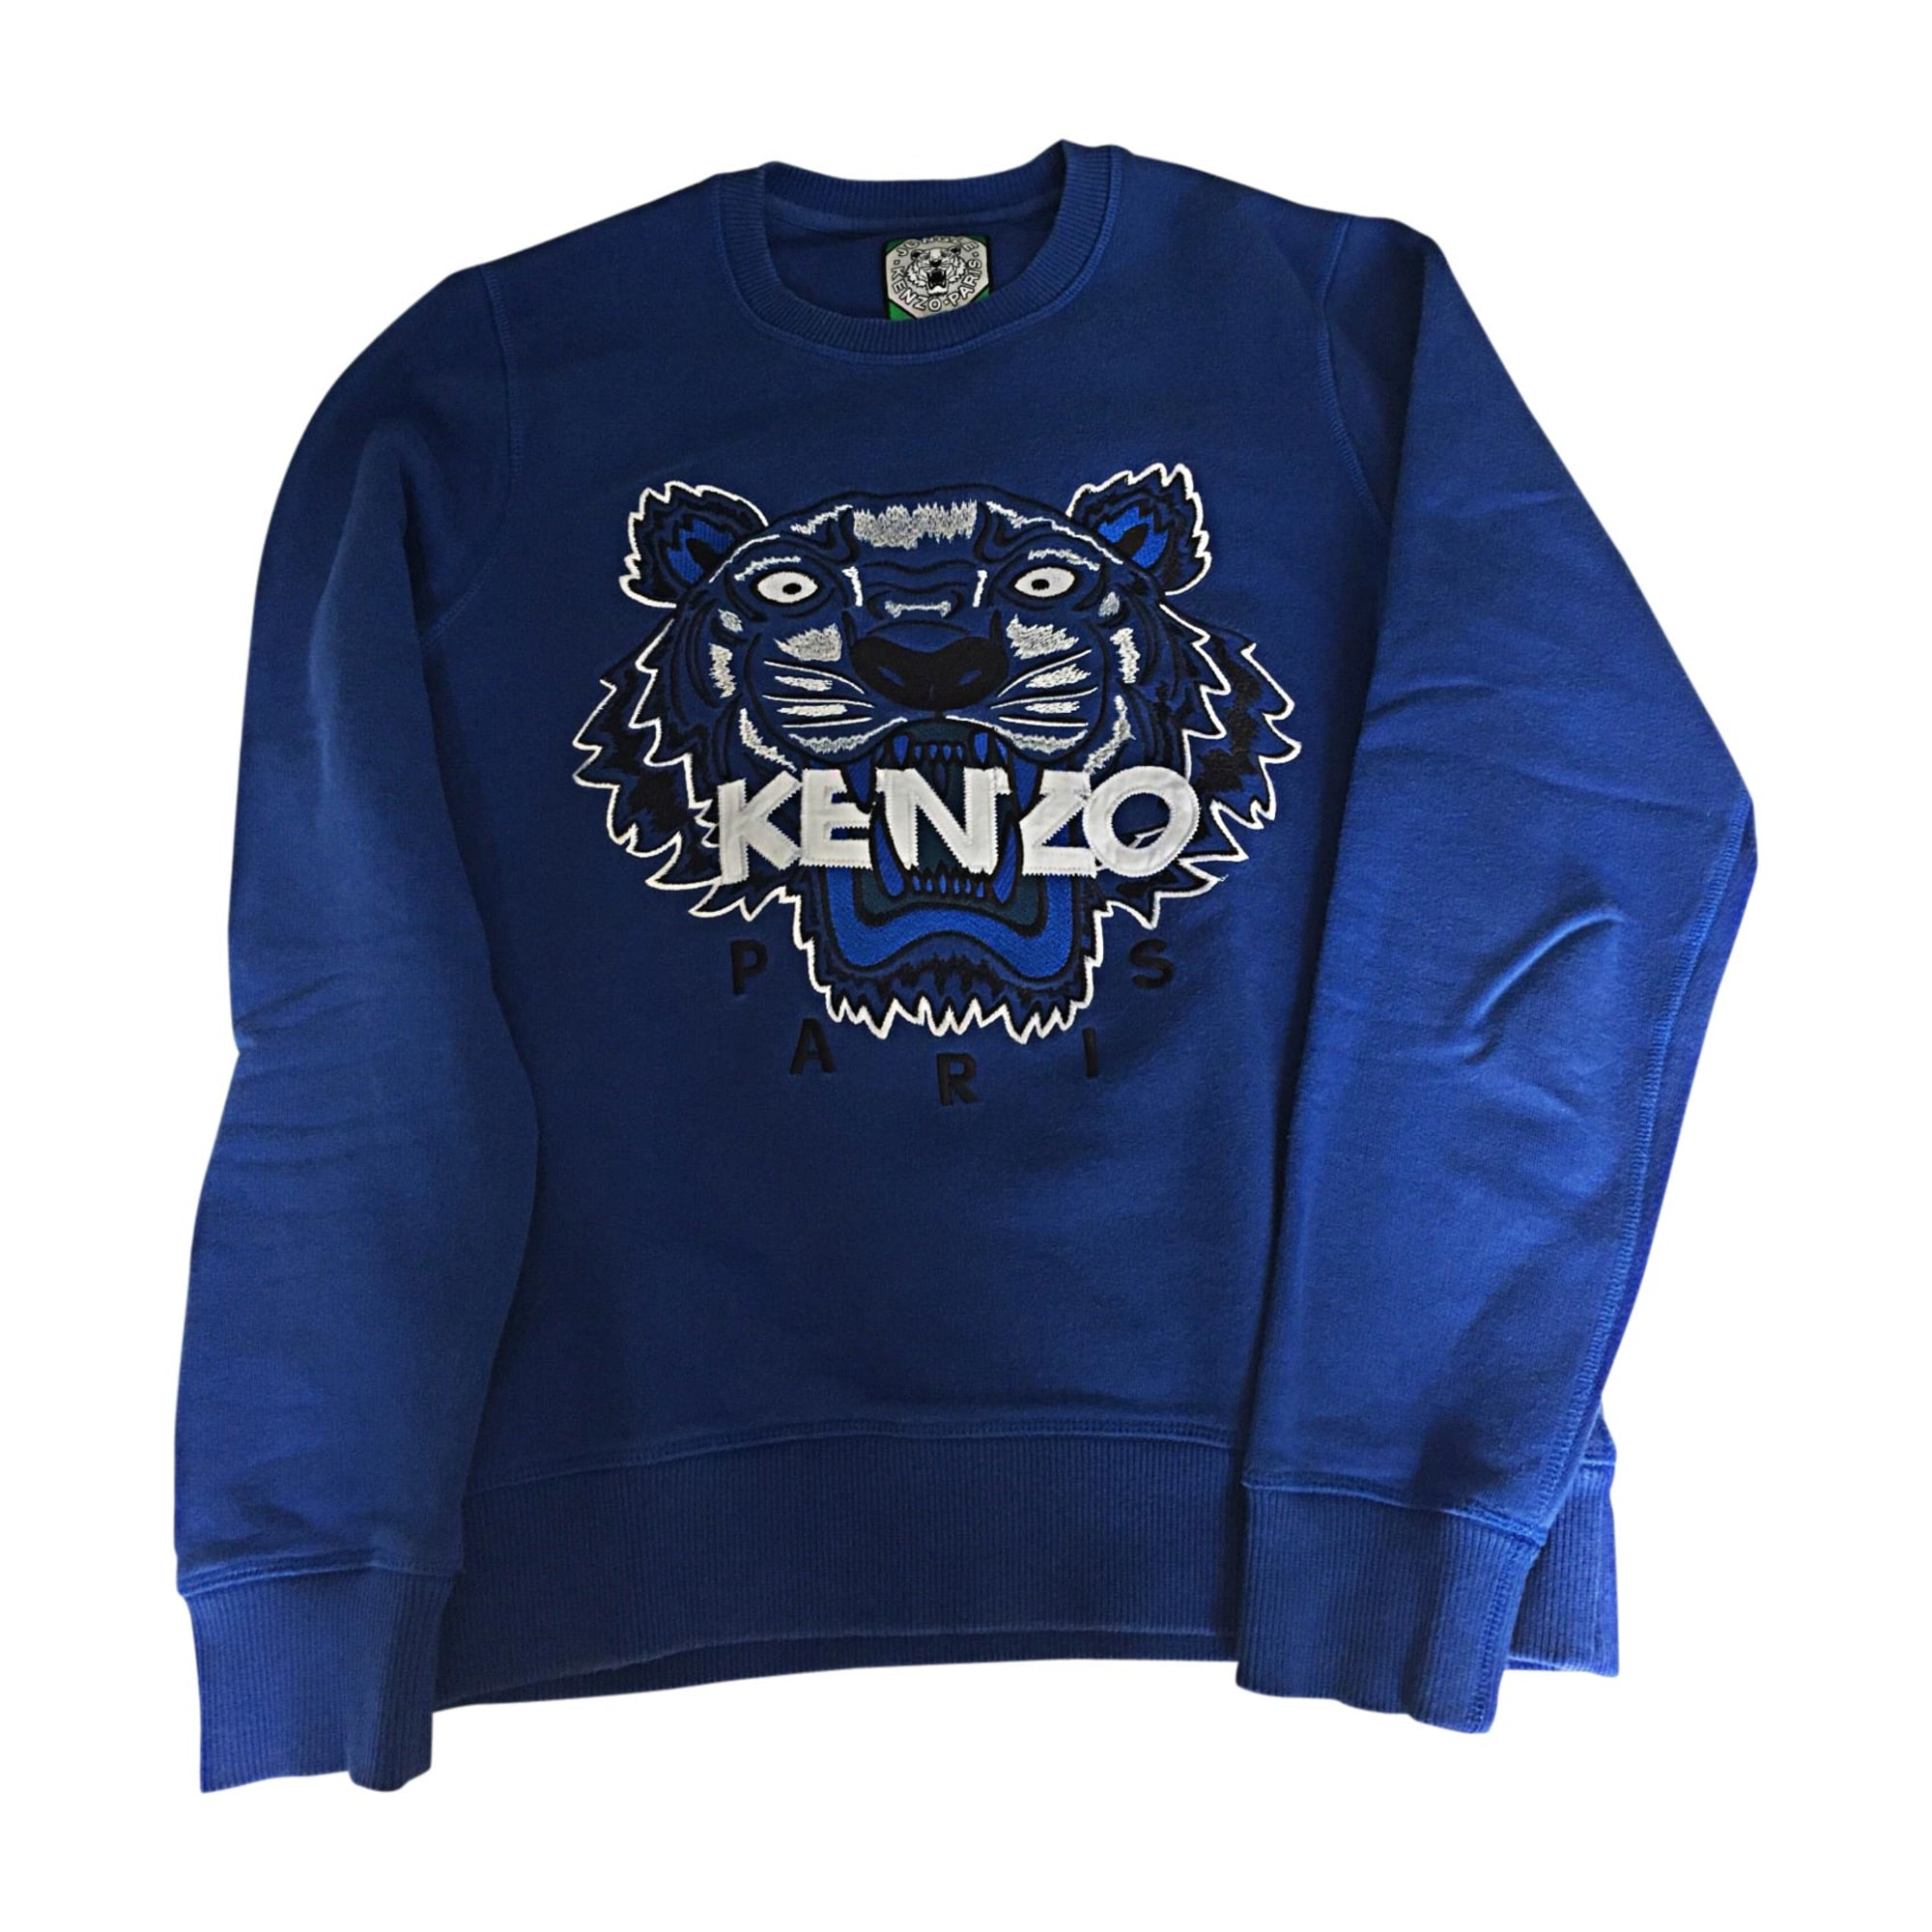 53c976aba48 Sweat KENZO 0 (XS) bleu - 7909501